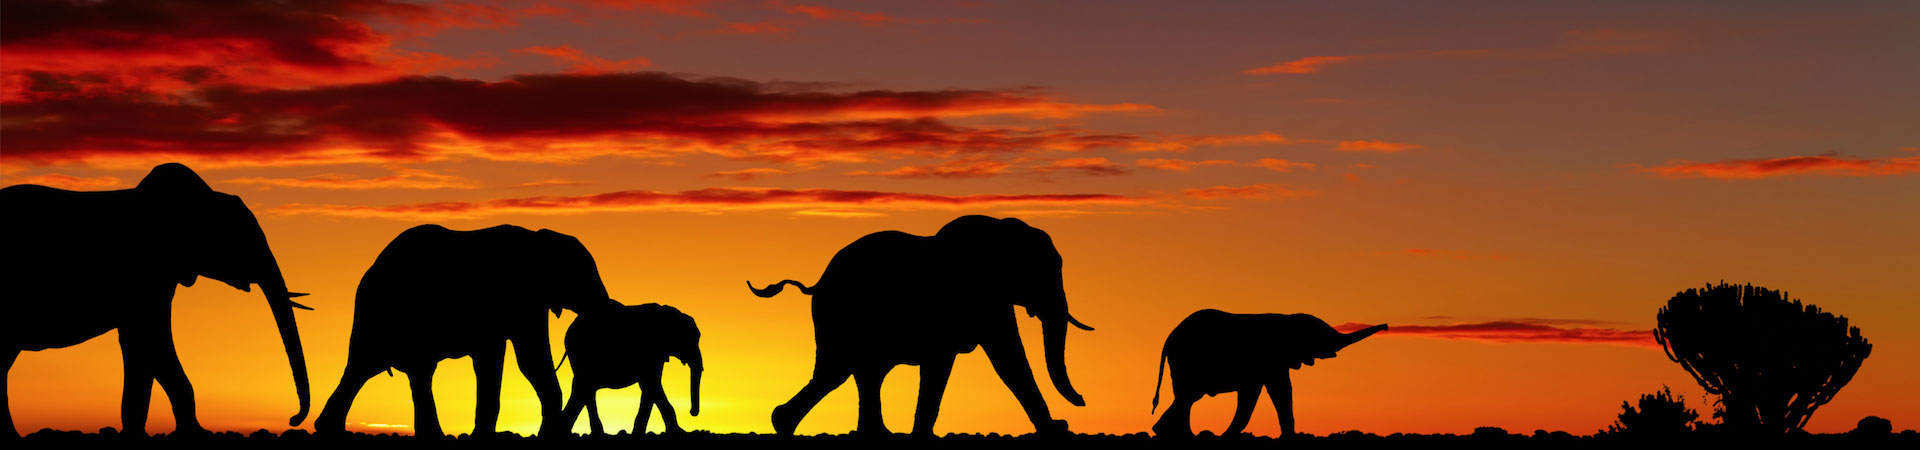 Elephant_Slider